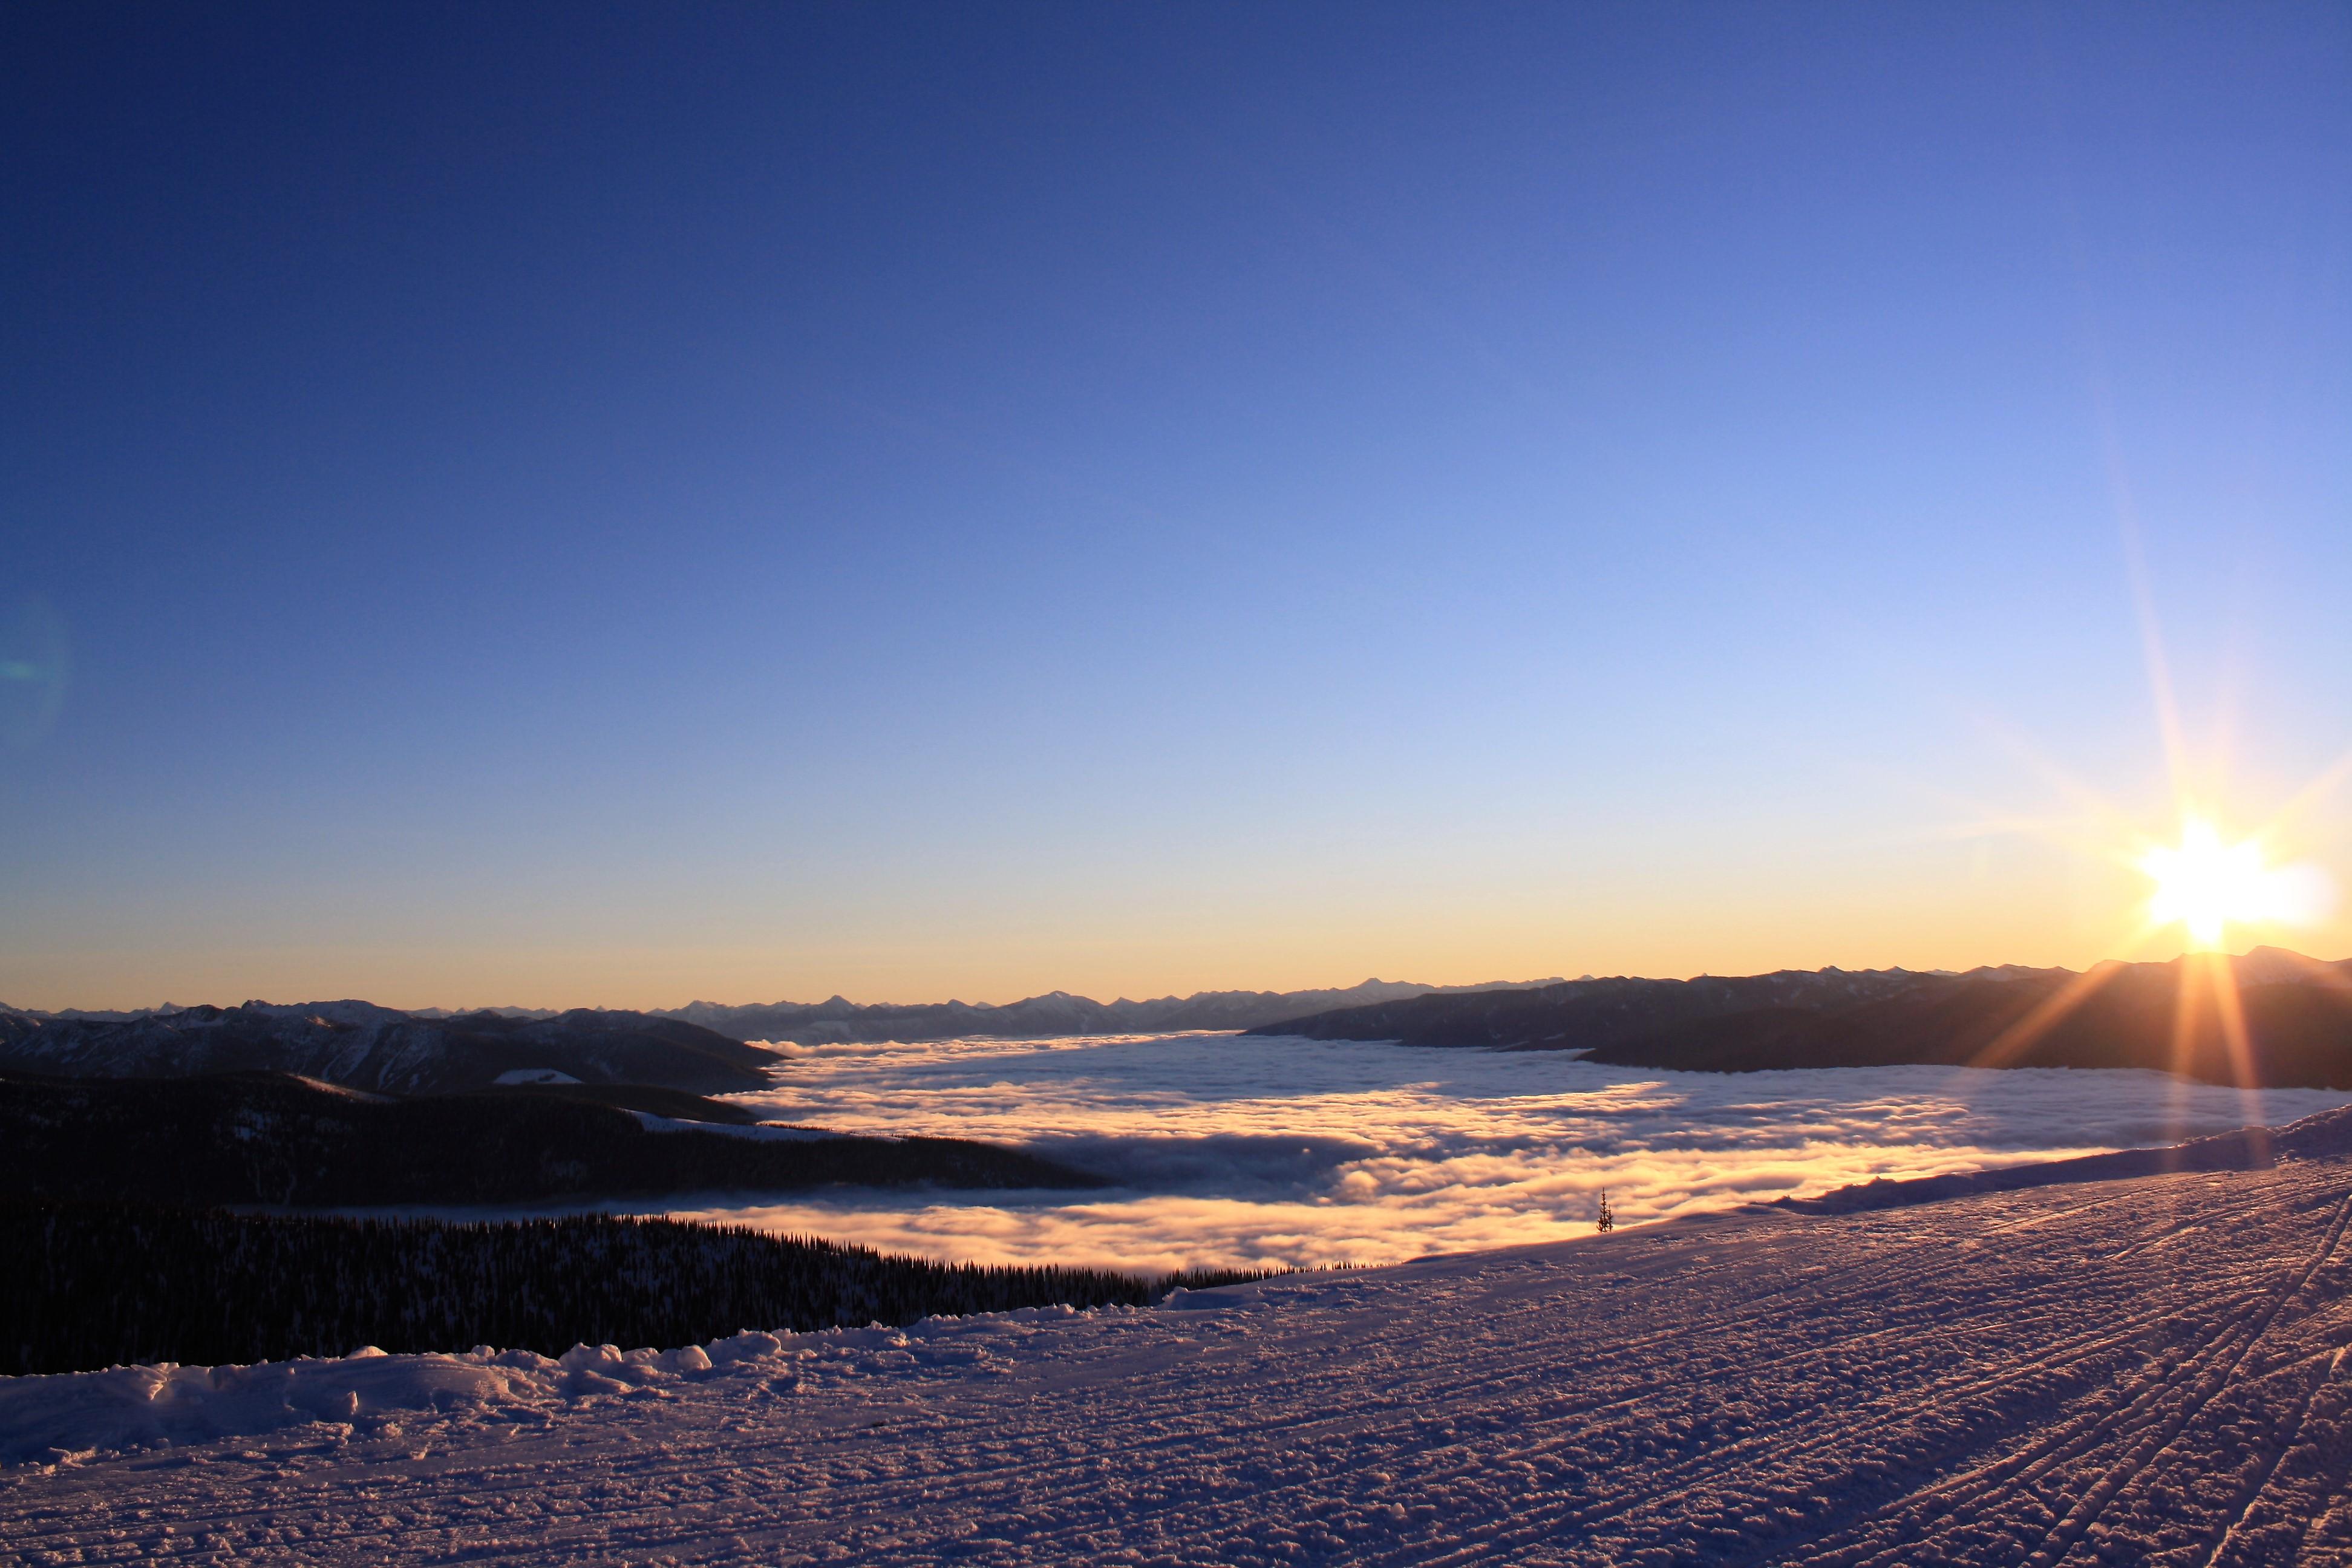 DM_nature_winter_kootenays_1852